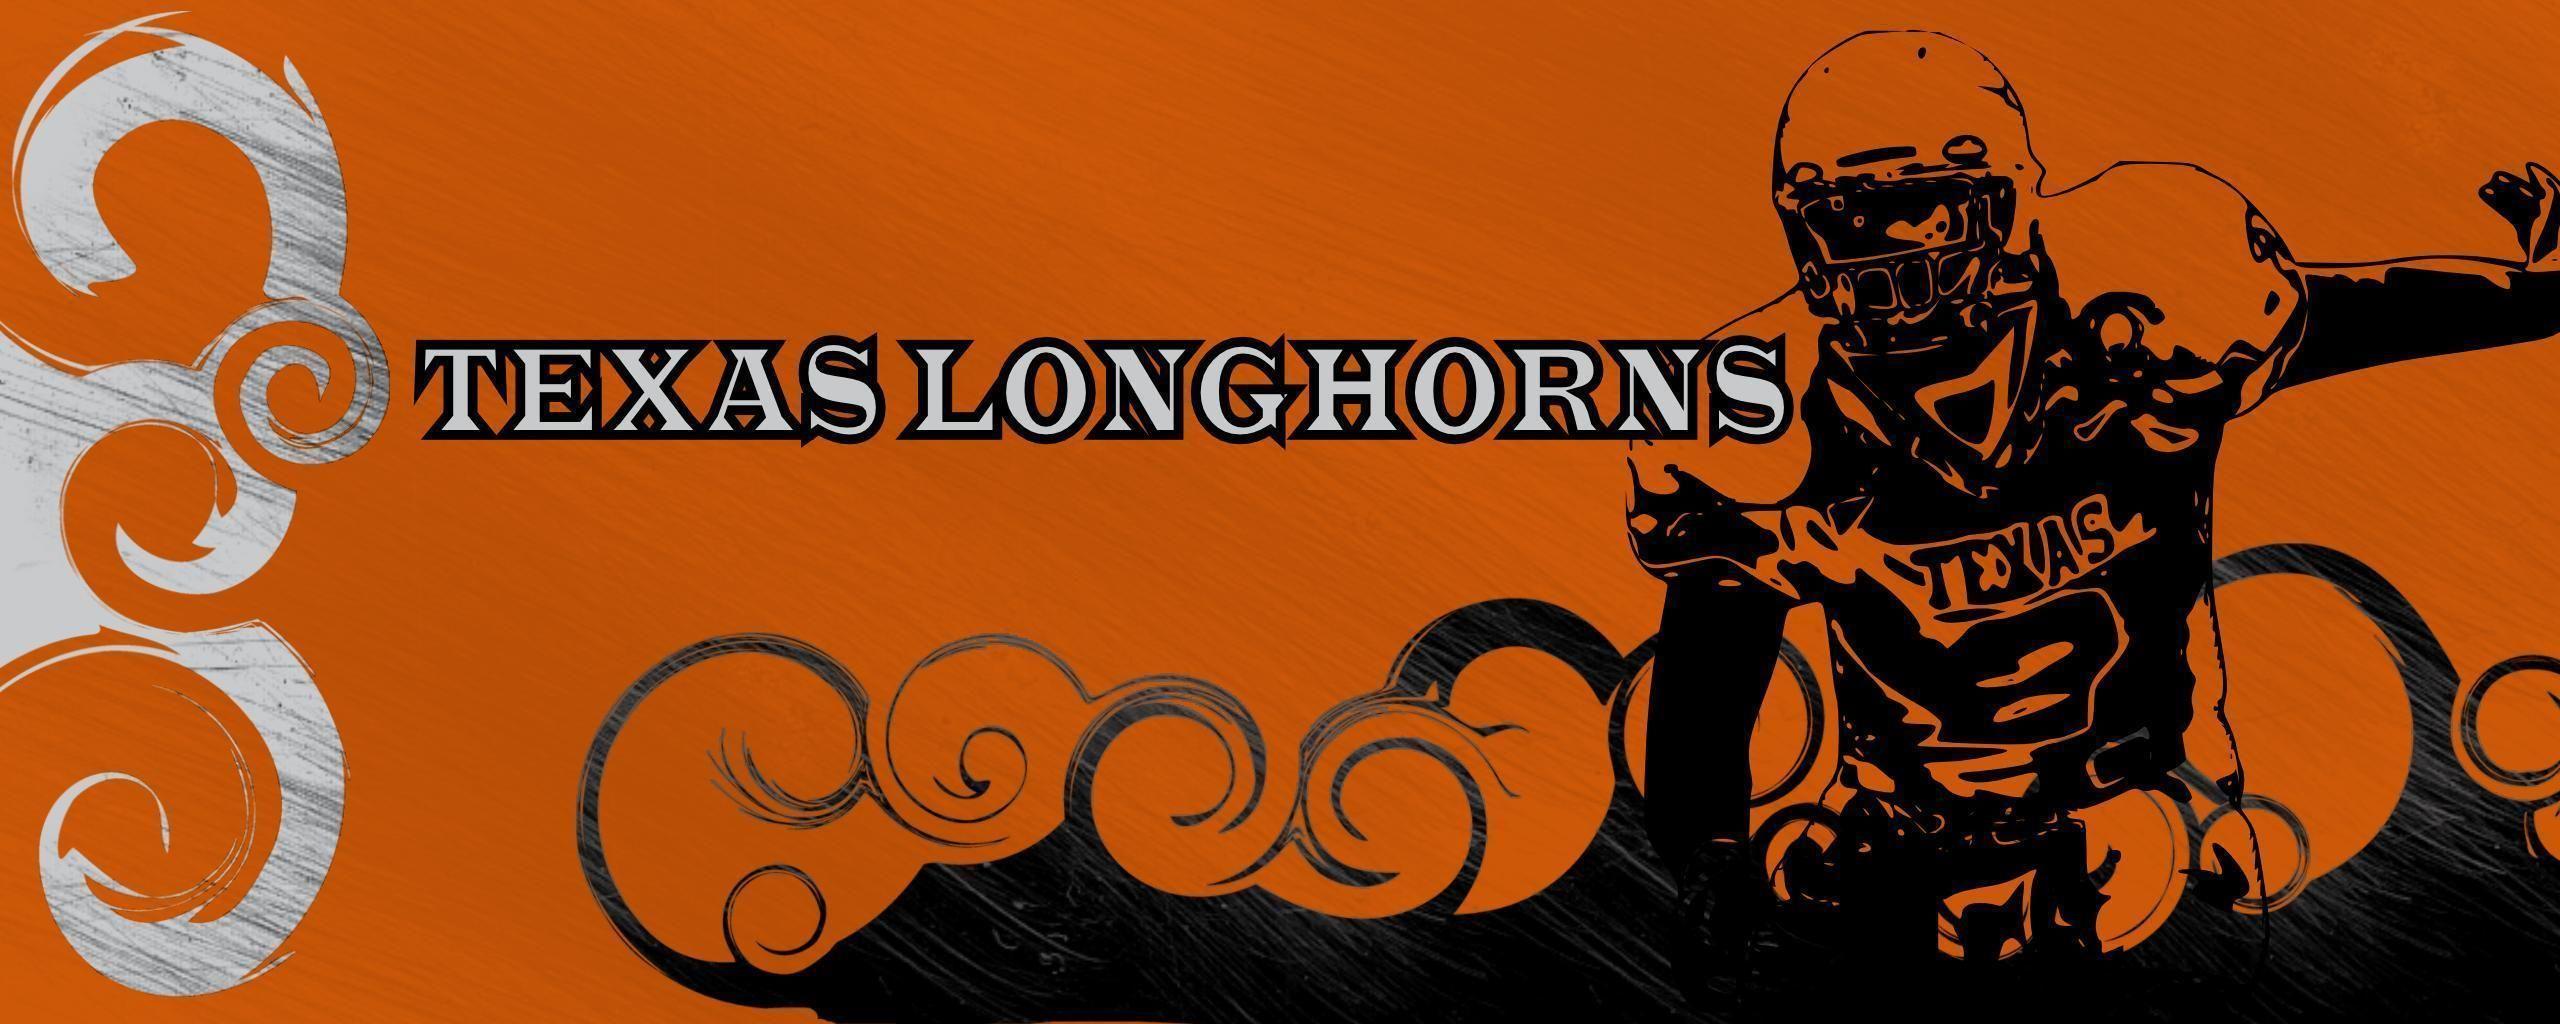 Texas Longhorns Logo Wallpapers 35 Wallpapers Wallpapers For Desktop Texas Longhorns Football Longhorns Football Longhorn